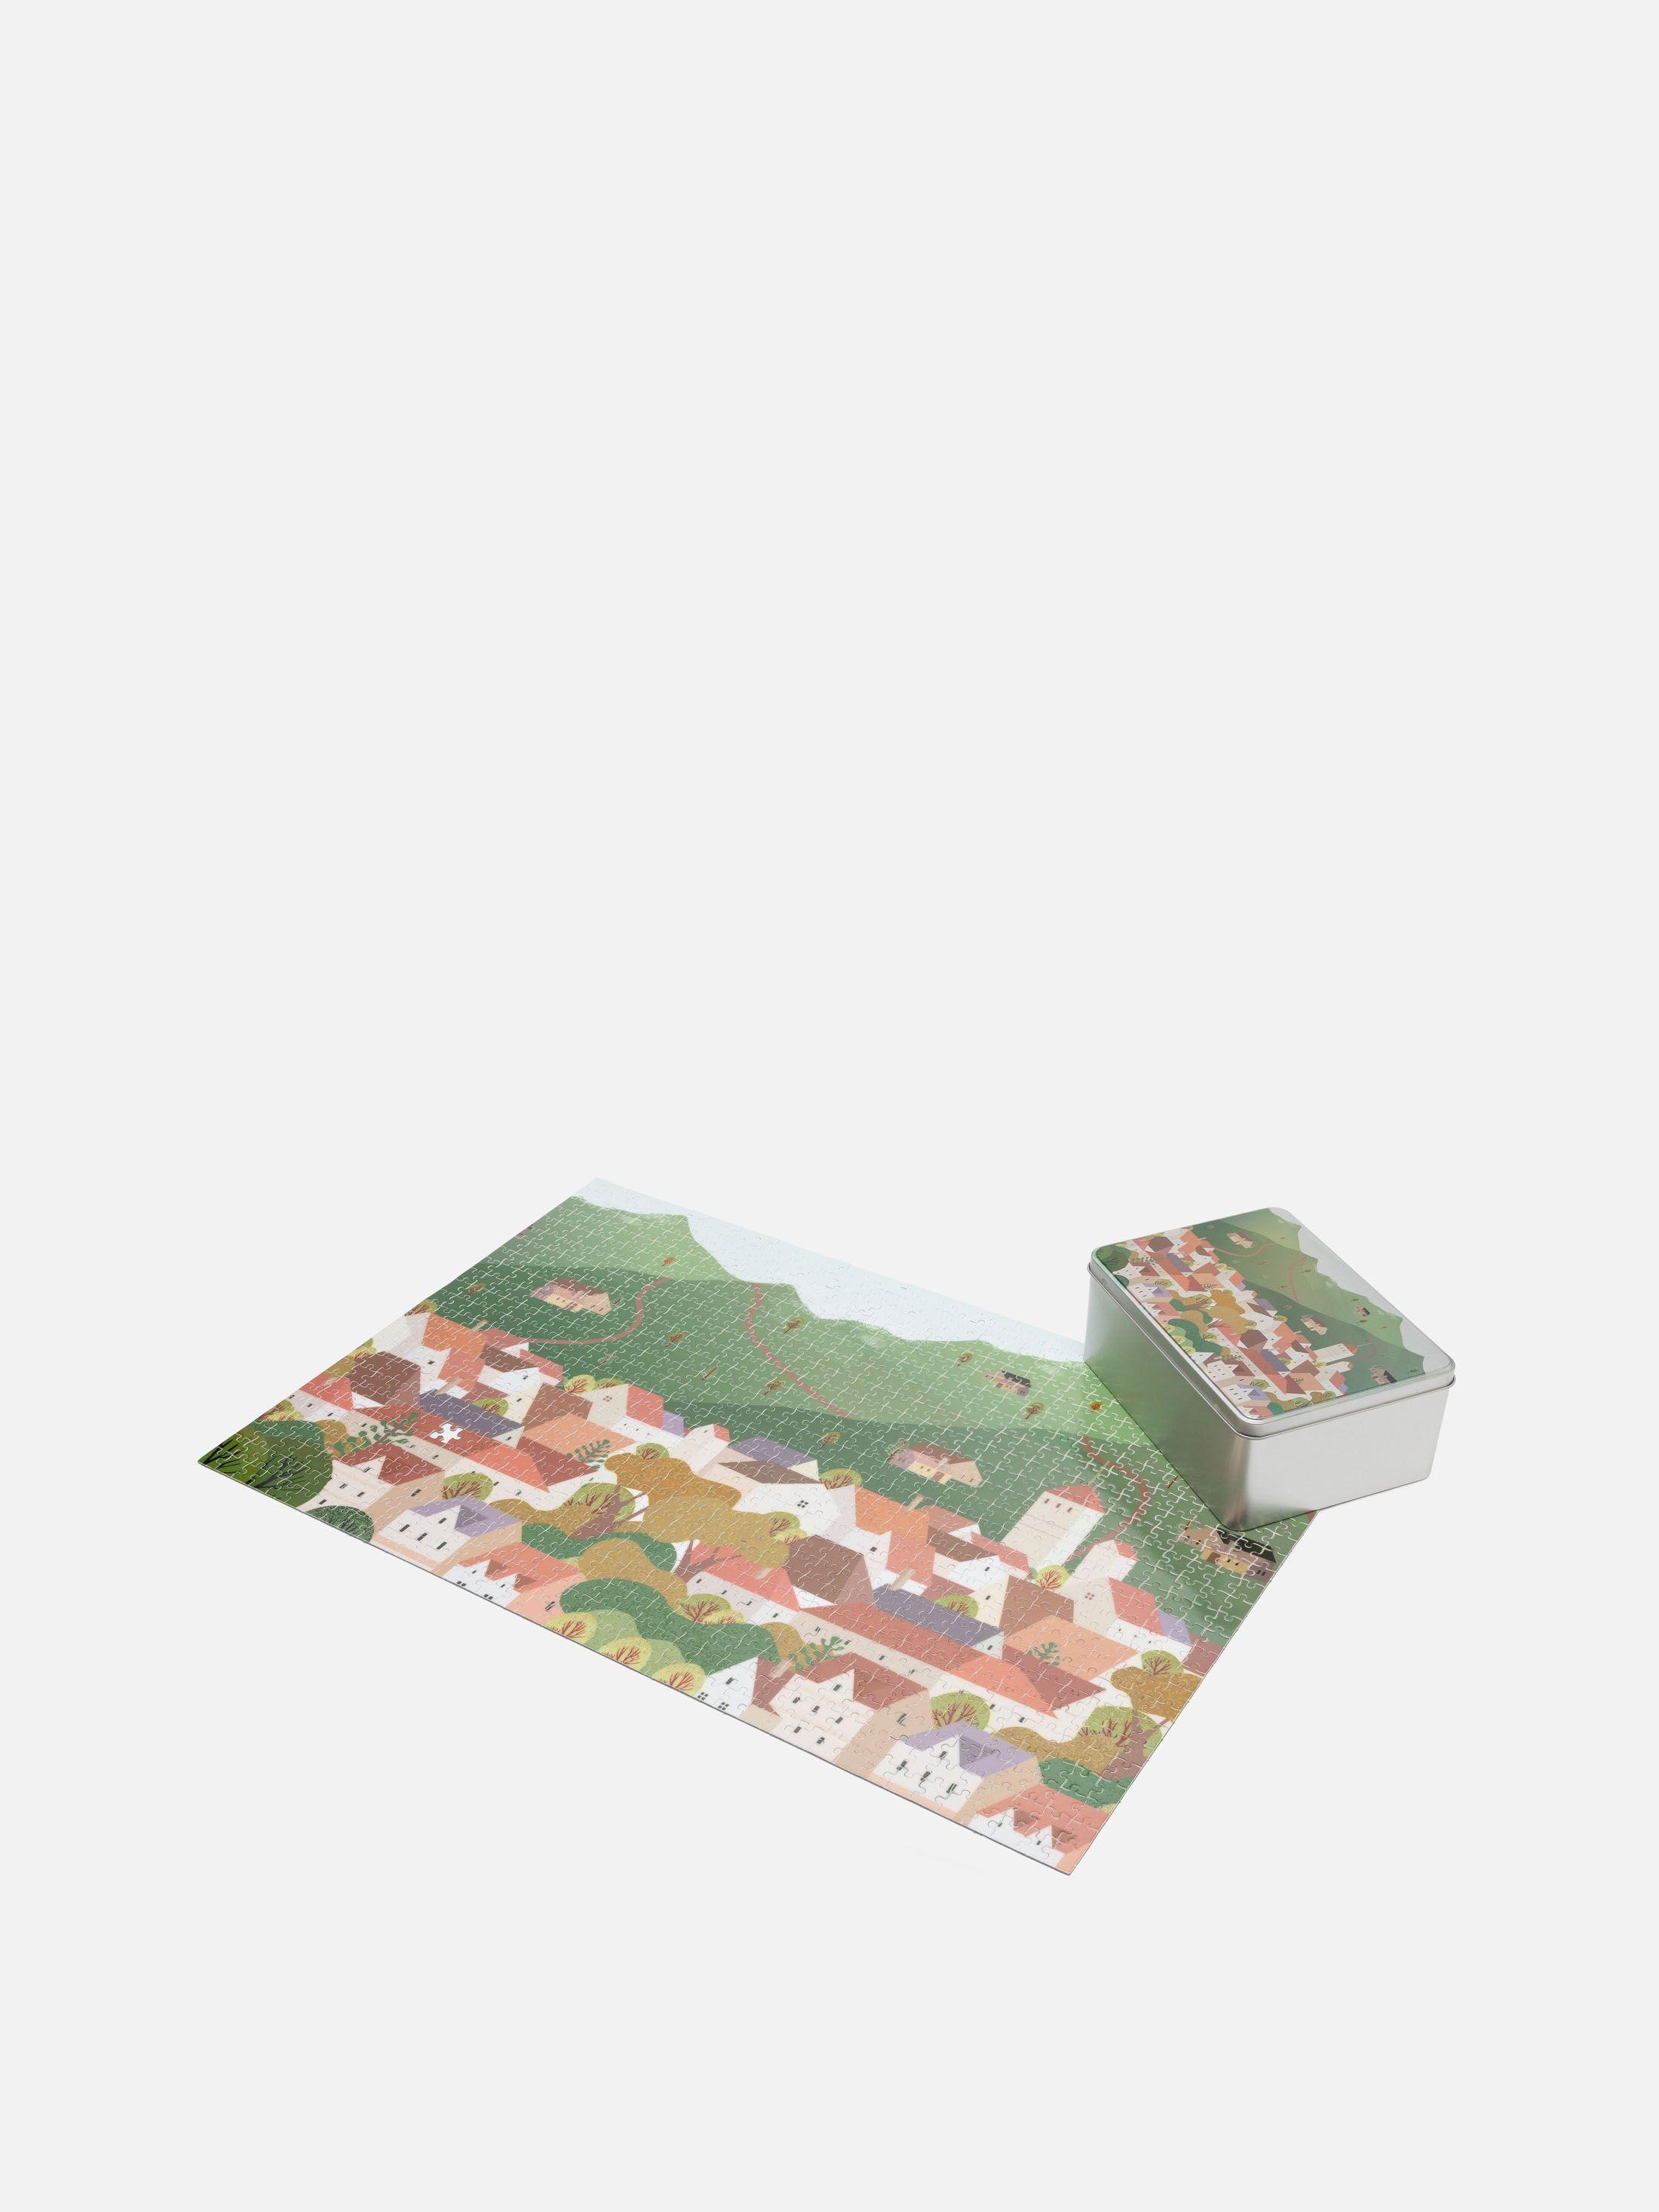 Puzzle drucken lassen